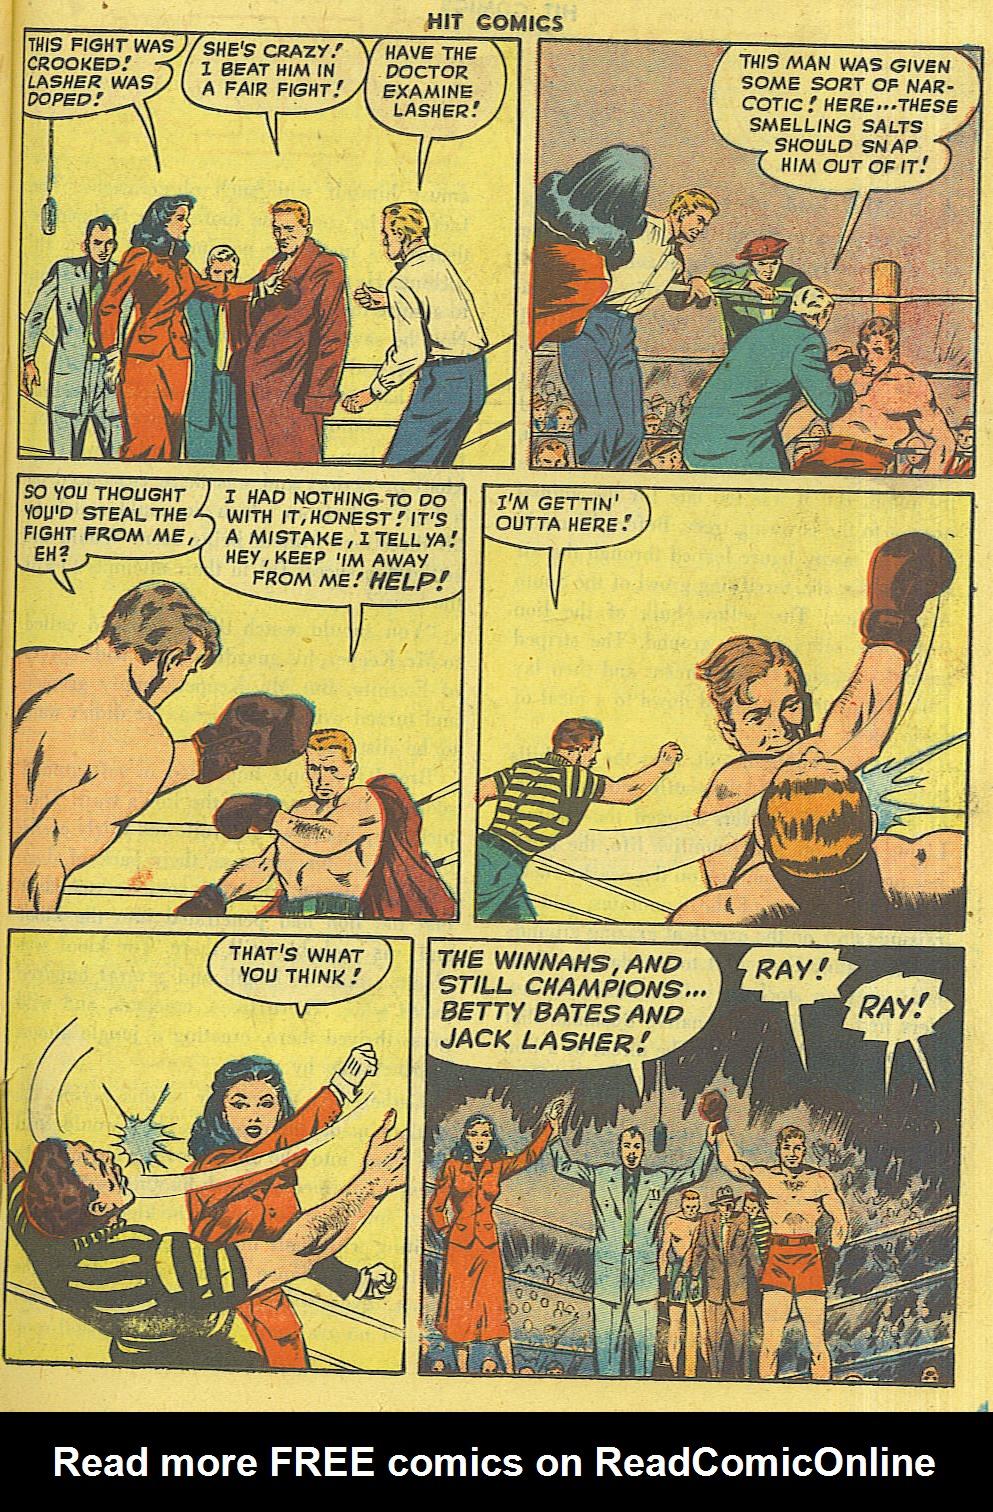 Read online Hit Comics comic -  Issue #56 - 37